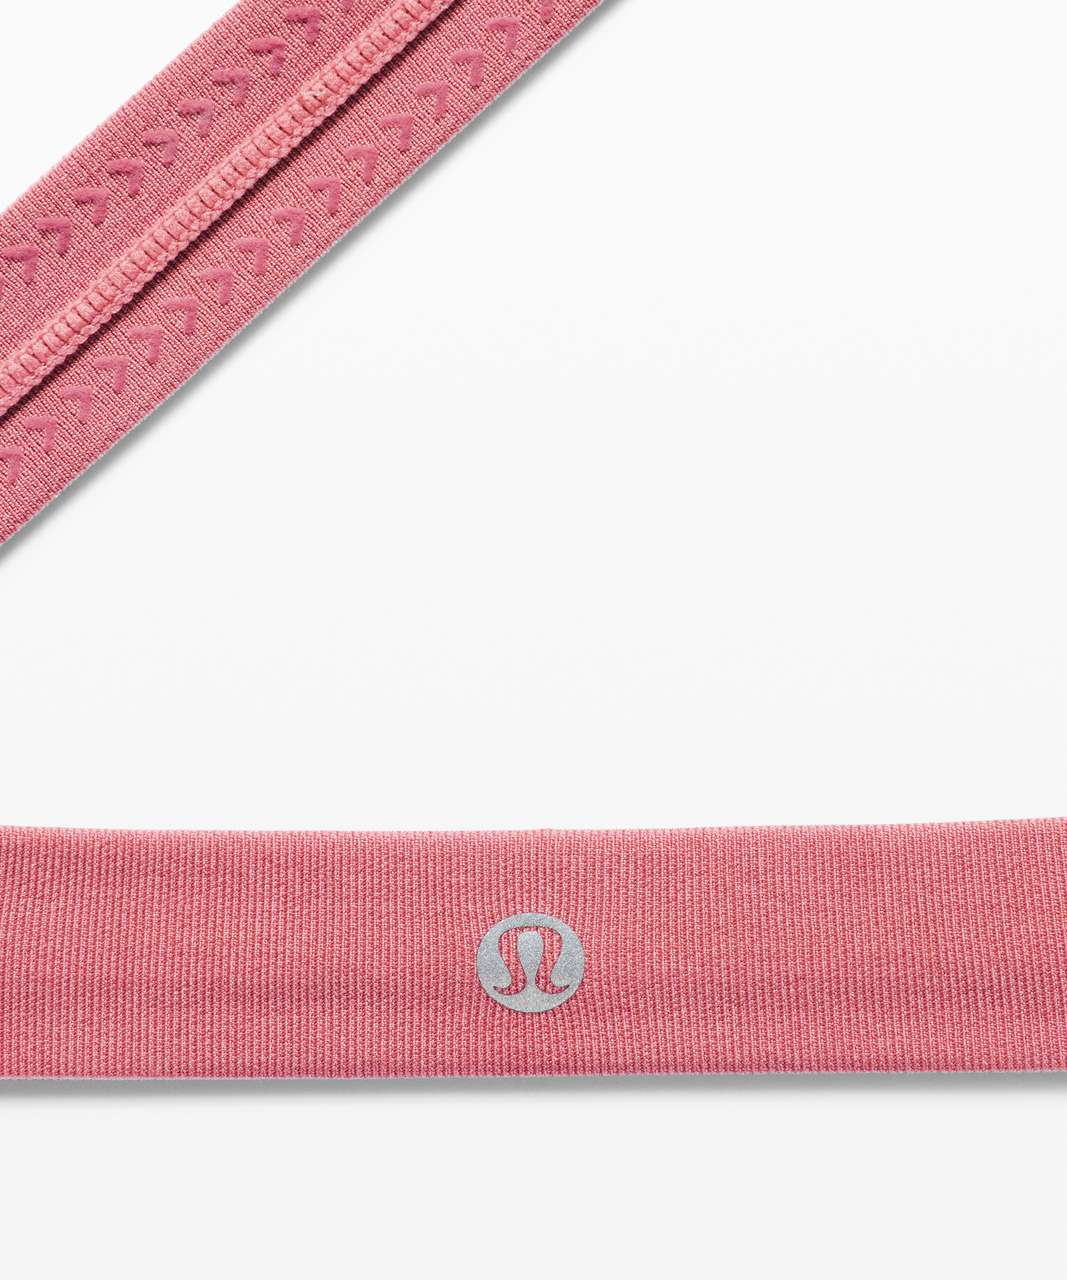 Lululemon Cardio Cross Trainer Headband - Heathered Brier Rose